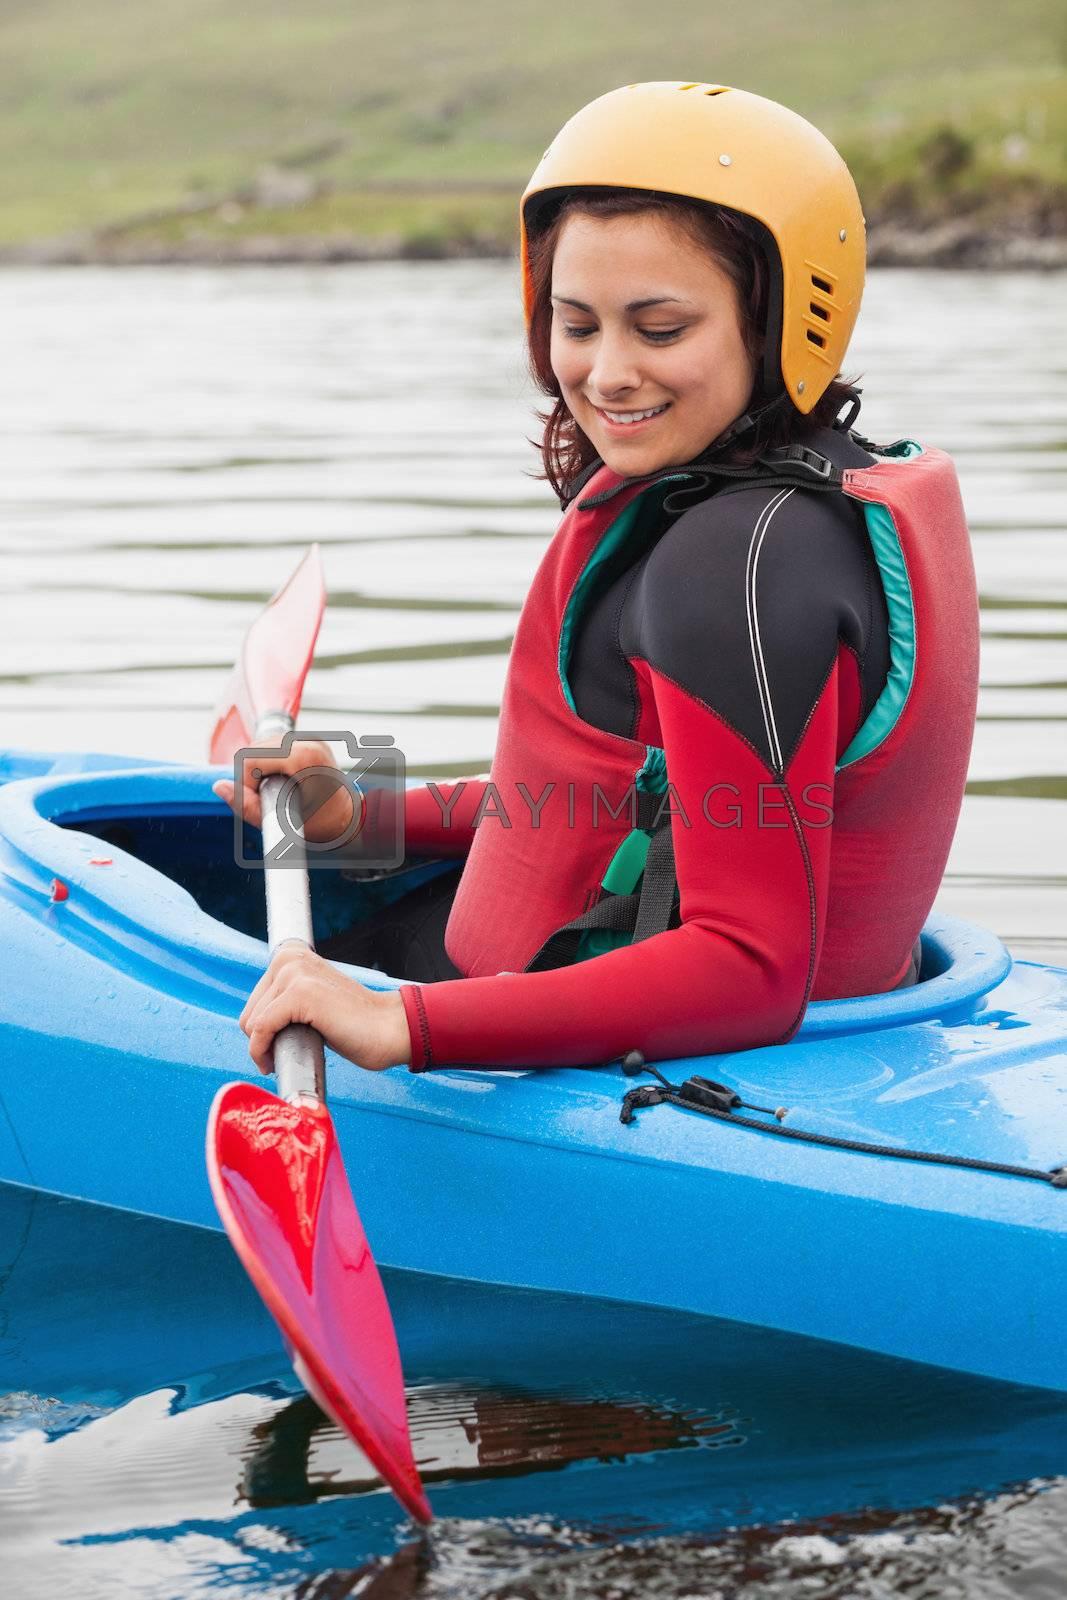 Fit woman rowing on lake by Wavebreakmedia